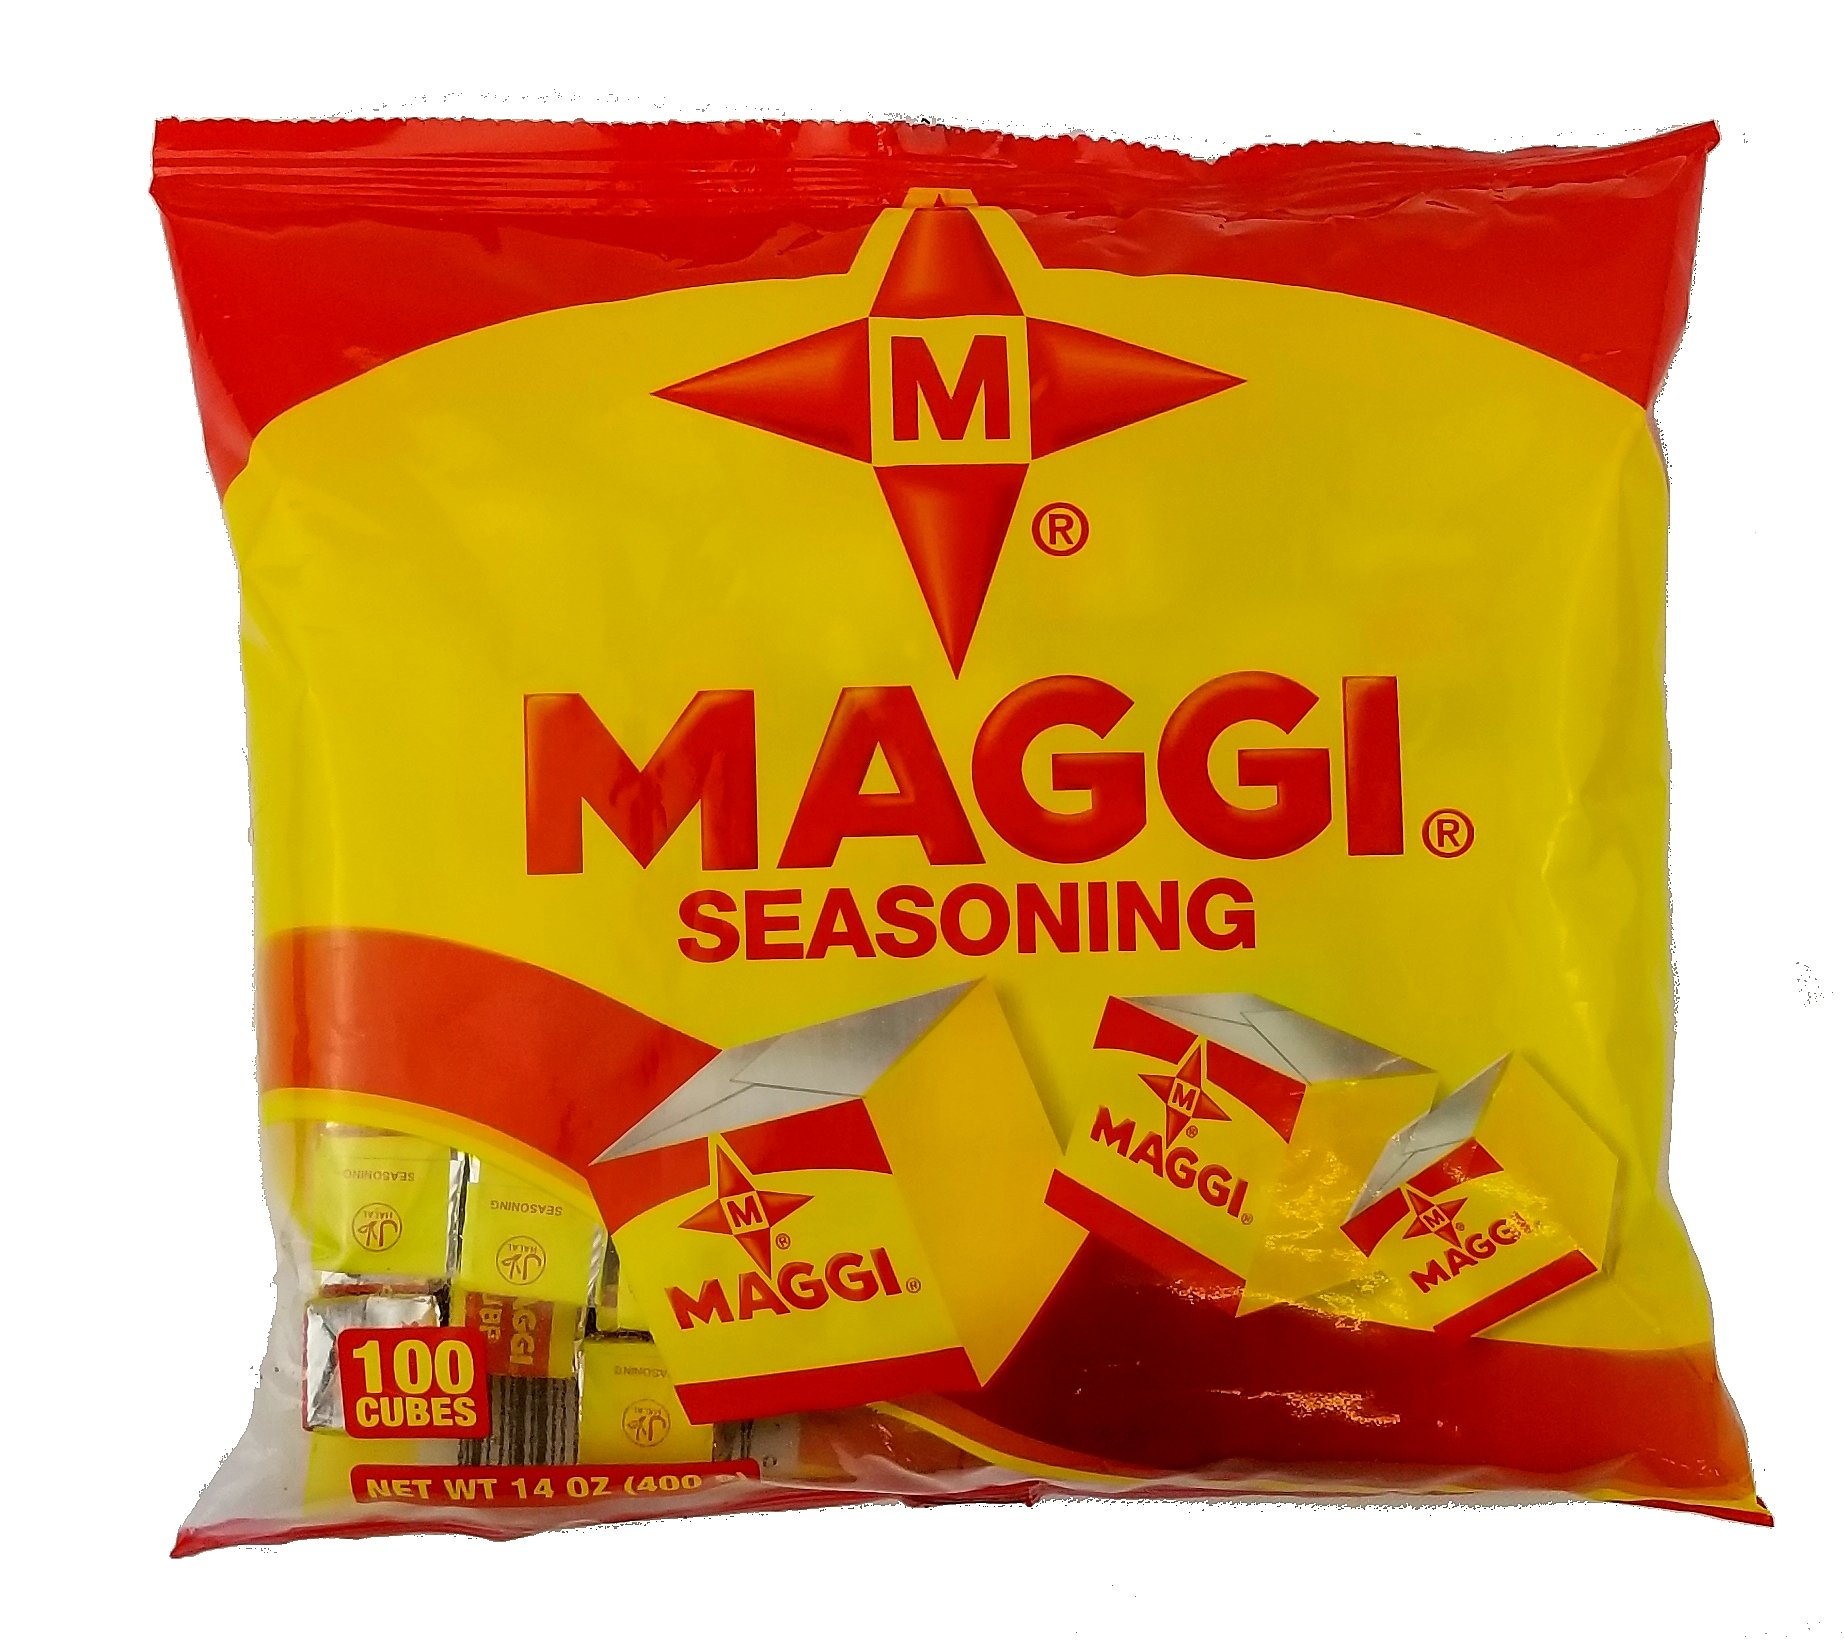 Maggi Cube Seasoning, 100 cubes